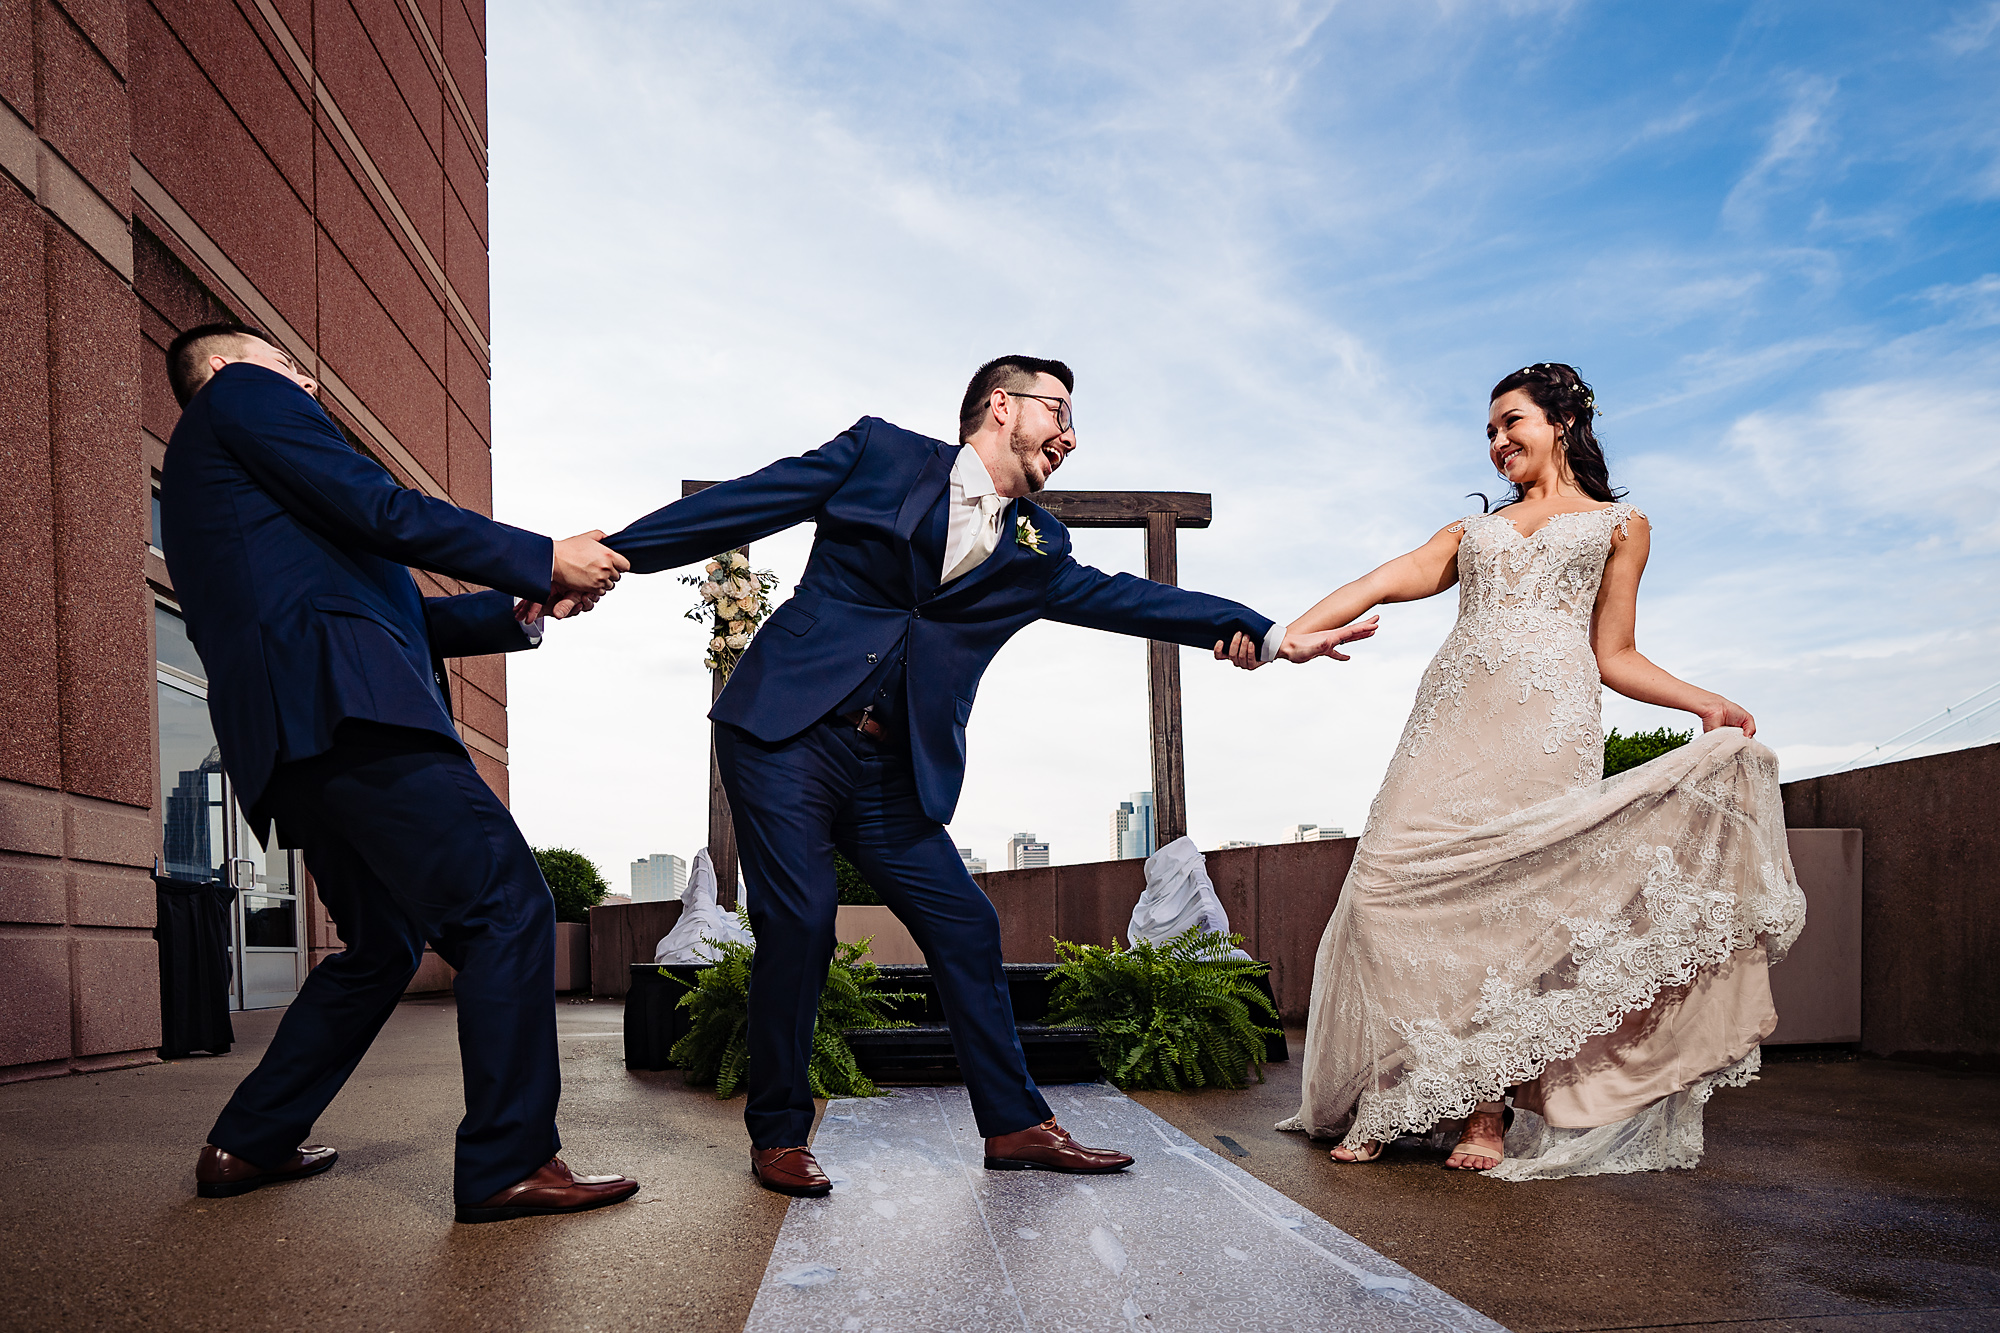 Embassy-Suites-Rivercenter-Wedding-Photography-26.jpg